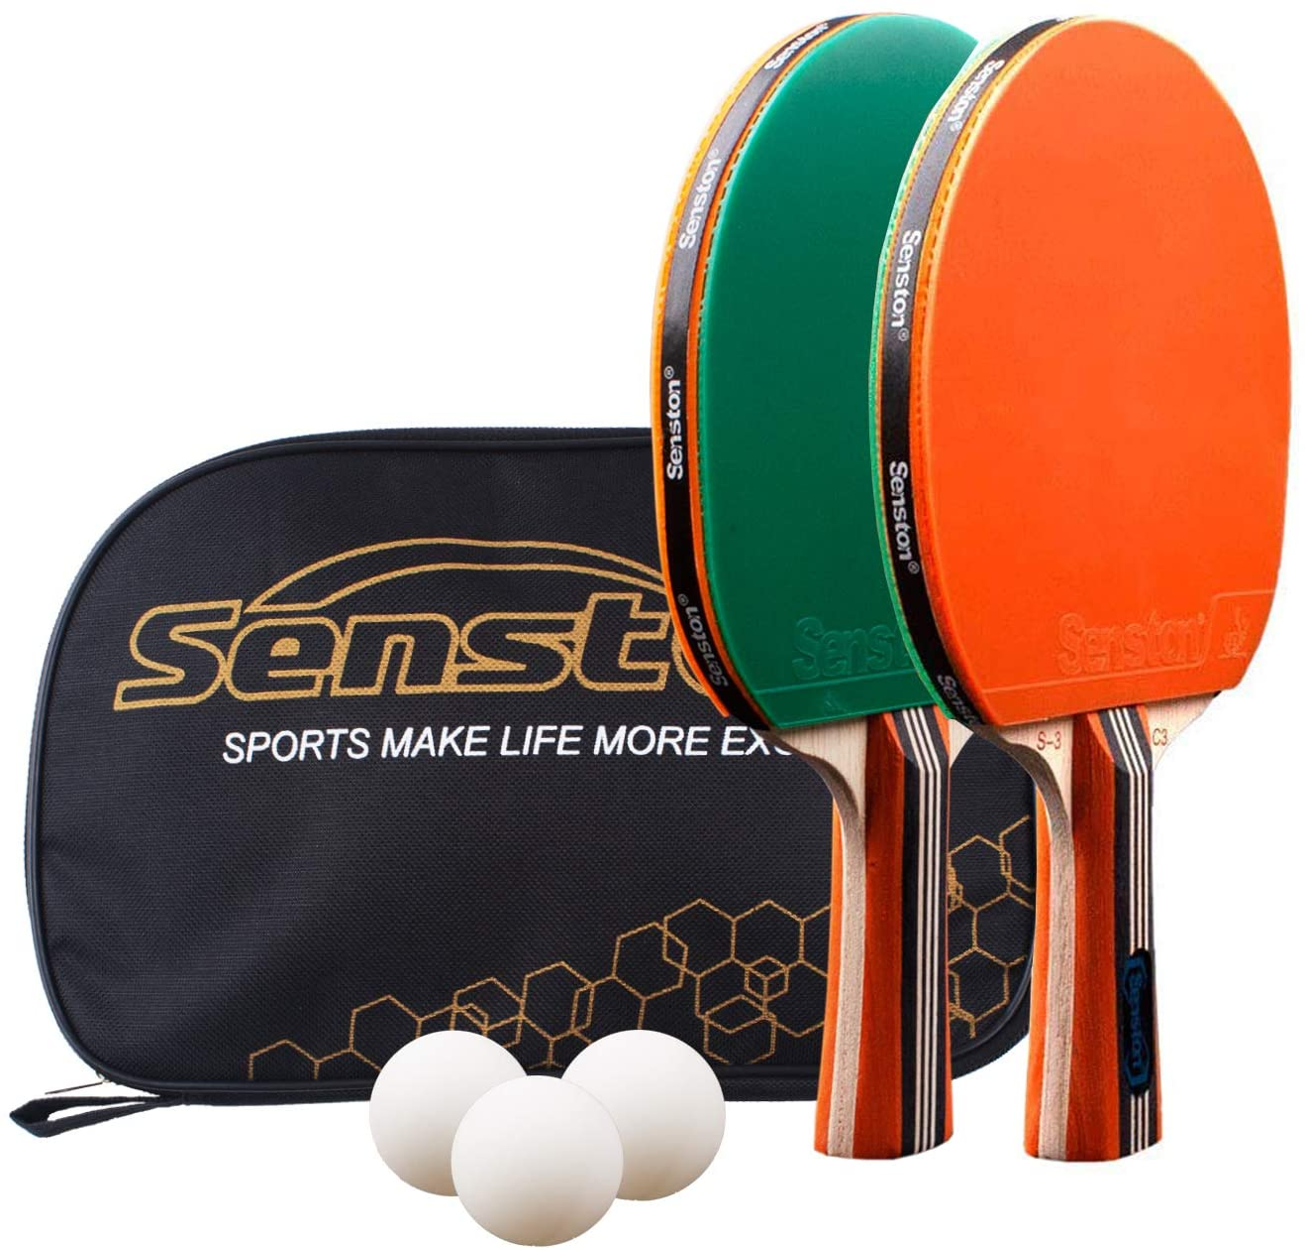 Senston Palas Ping Pong, Certificado por la ITTF Pelotas Ping Pong Set, 2 Raquetas de Tenis de Mesa + 3 Pelotas + 1 Bolsa,el Entrenamiento/Kit de Raqueta recreativa